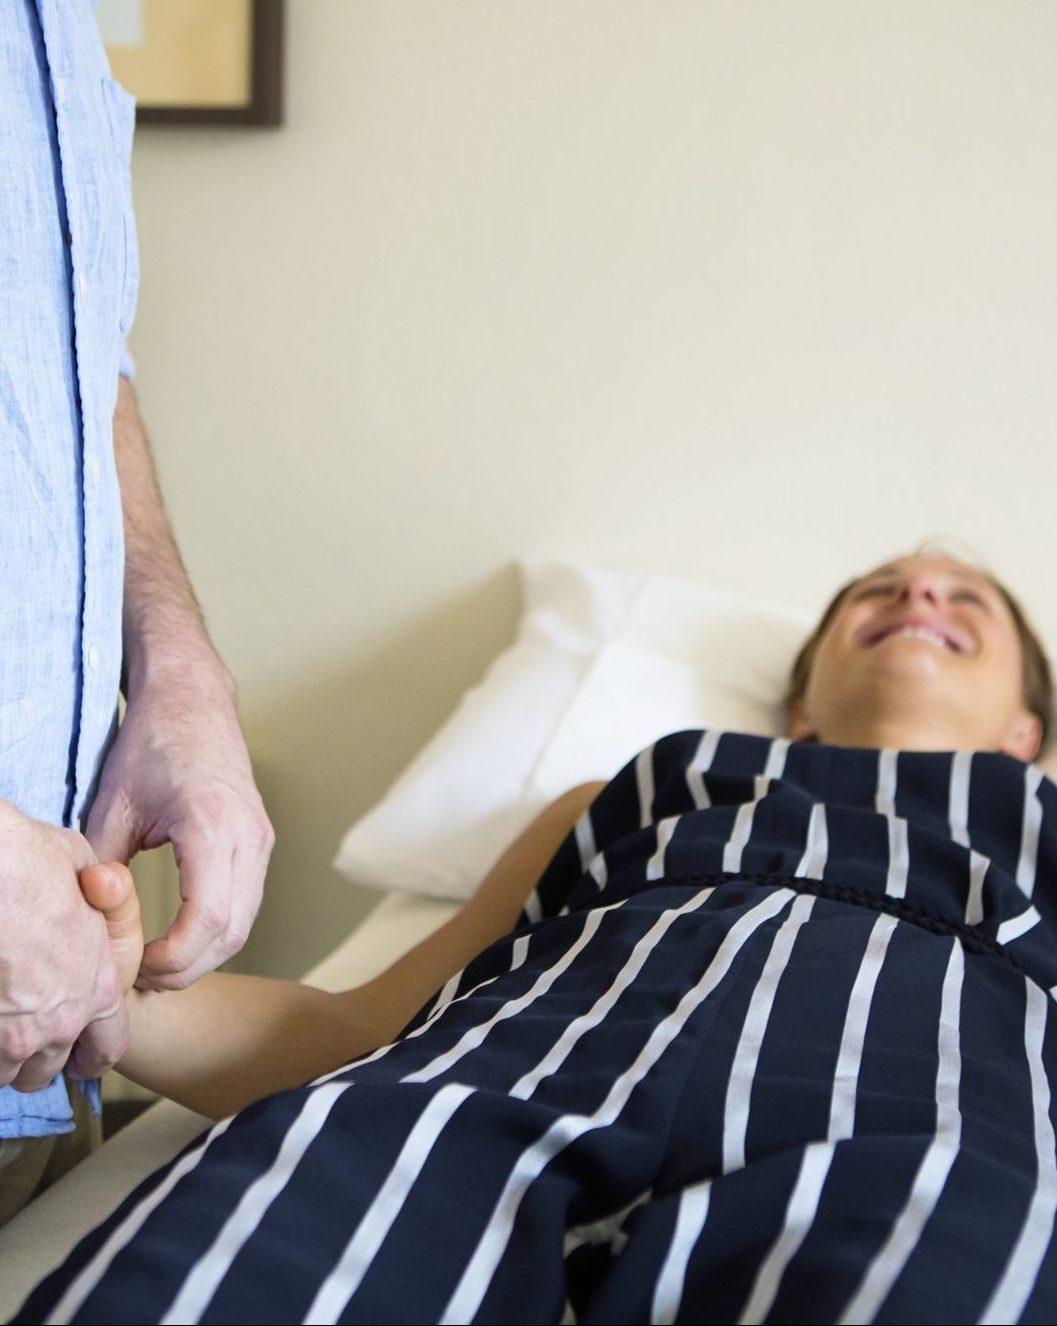 Taking a smiling patient's pulses | Bruce McCallum - five element acupuncture